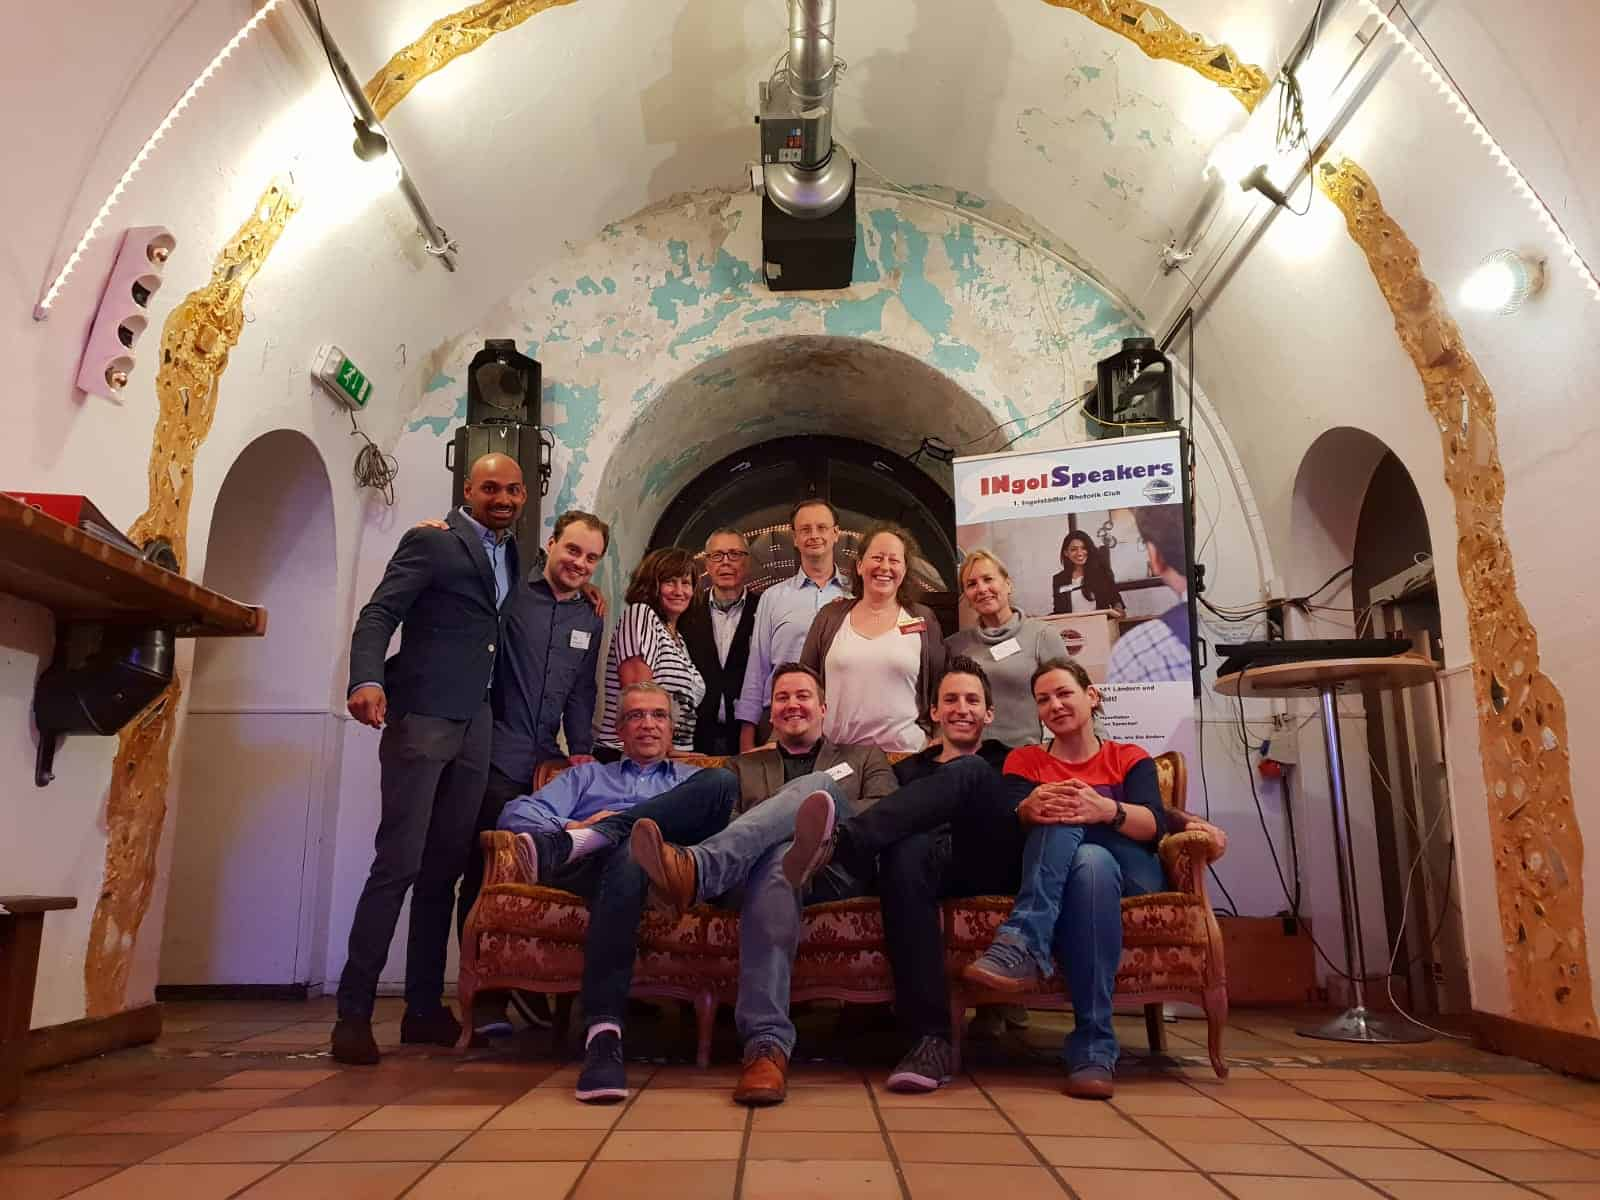 INgolSpeakers – neuer Toastmasterclub in Ingolstadt